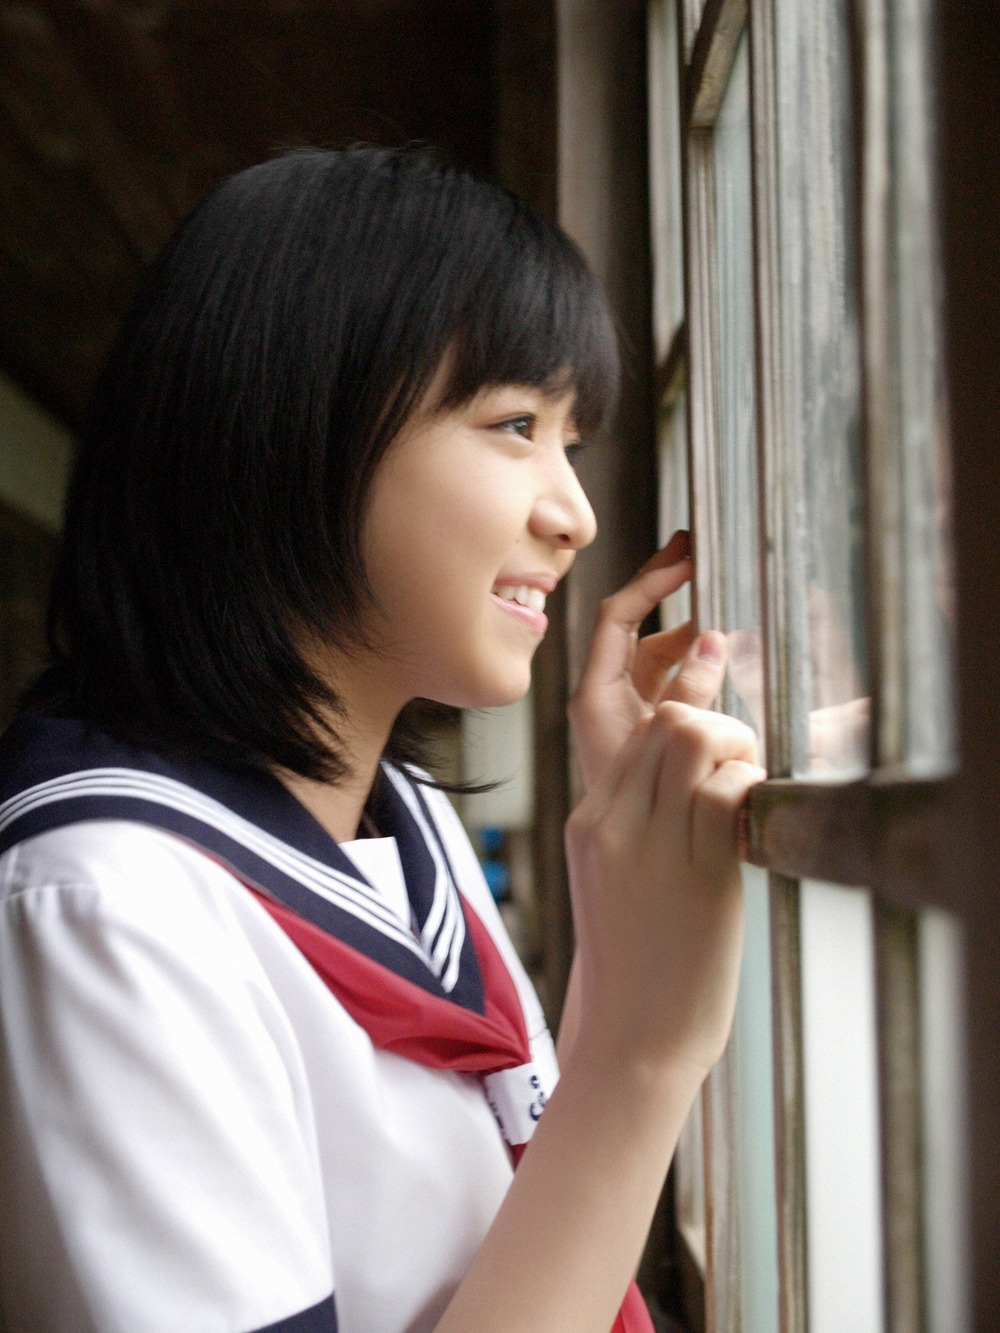 IVPhoto_Gravure :: [YS Web] Vol.537 Shizuka Nakamura 中村静香 少女の時間